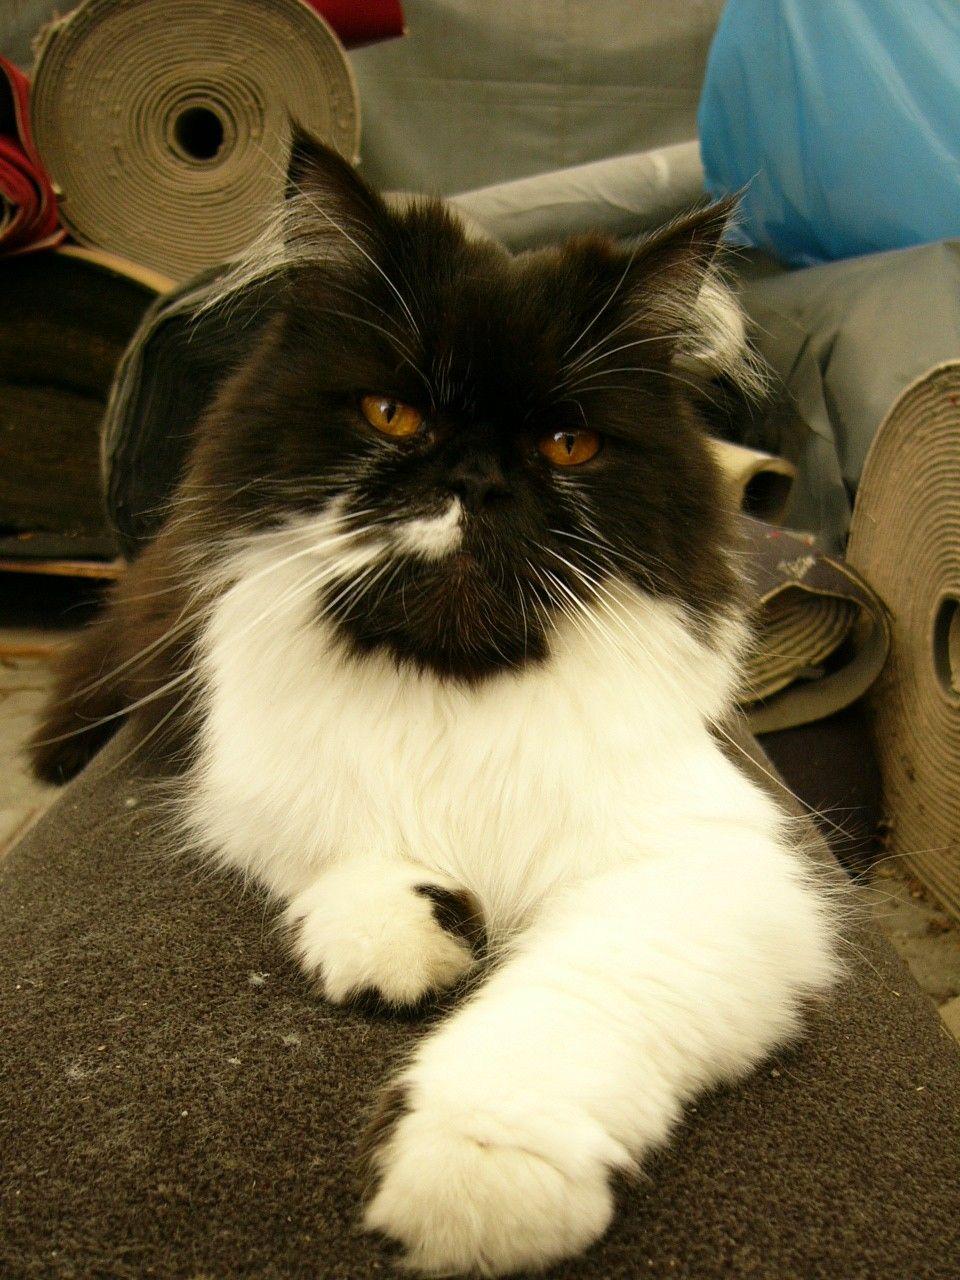 Pfiffi in the carpet store.